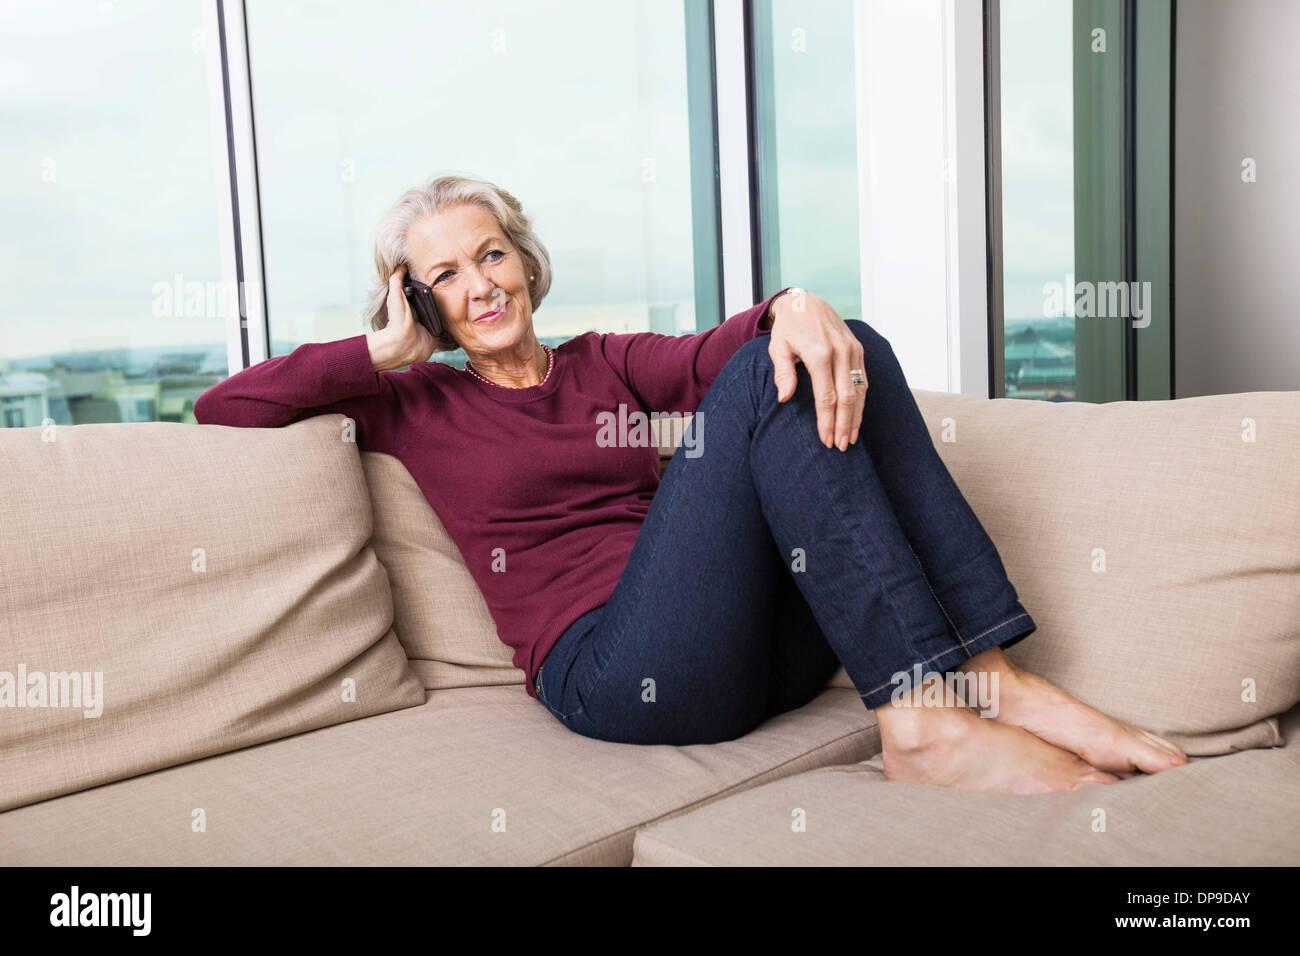 Full-length of senior woman répondre à smart phone on sofa at home Photo Stock